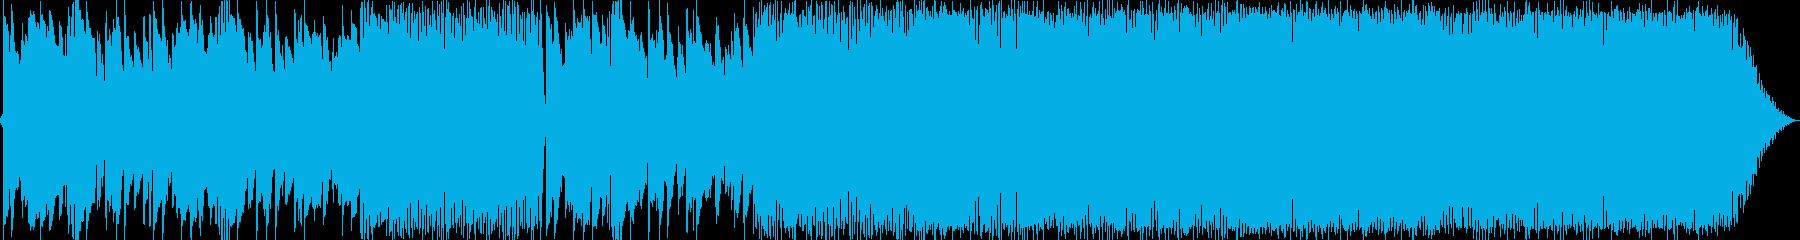 XYZの再生済みの波形